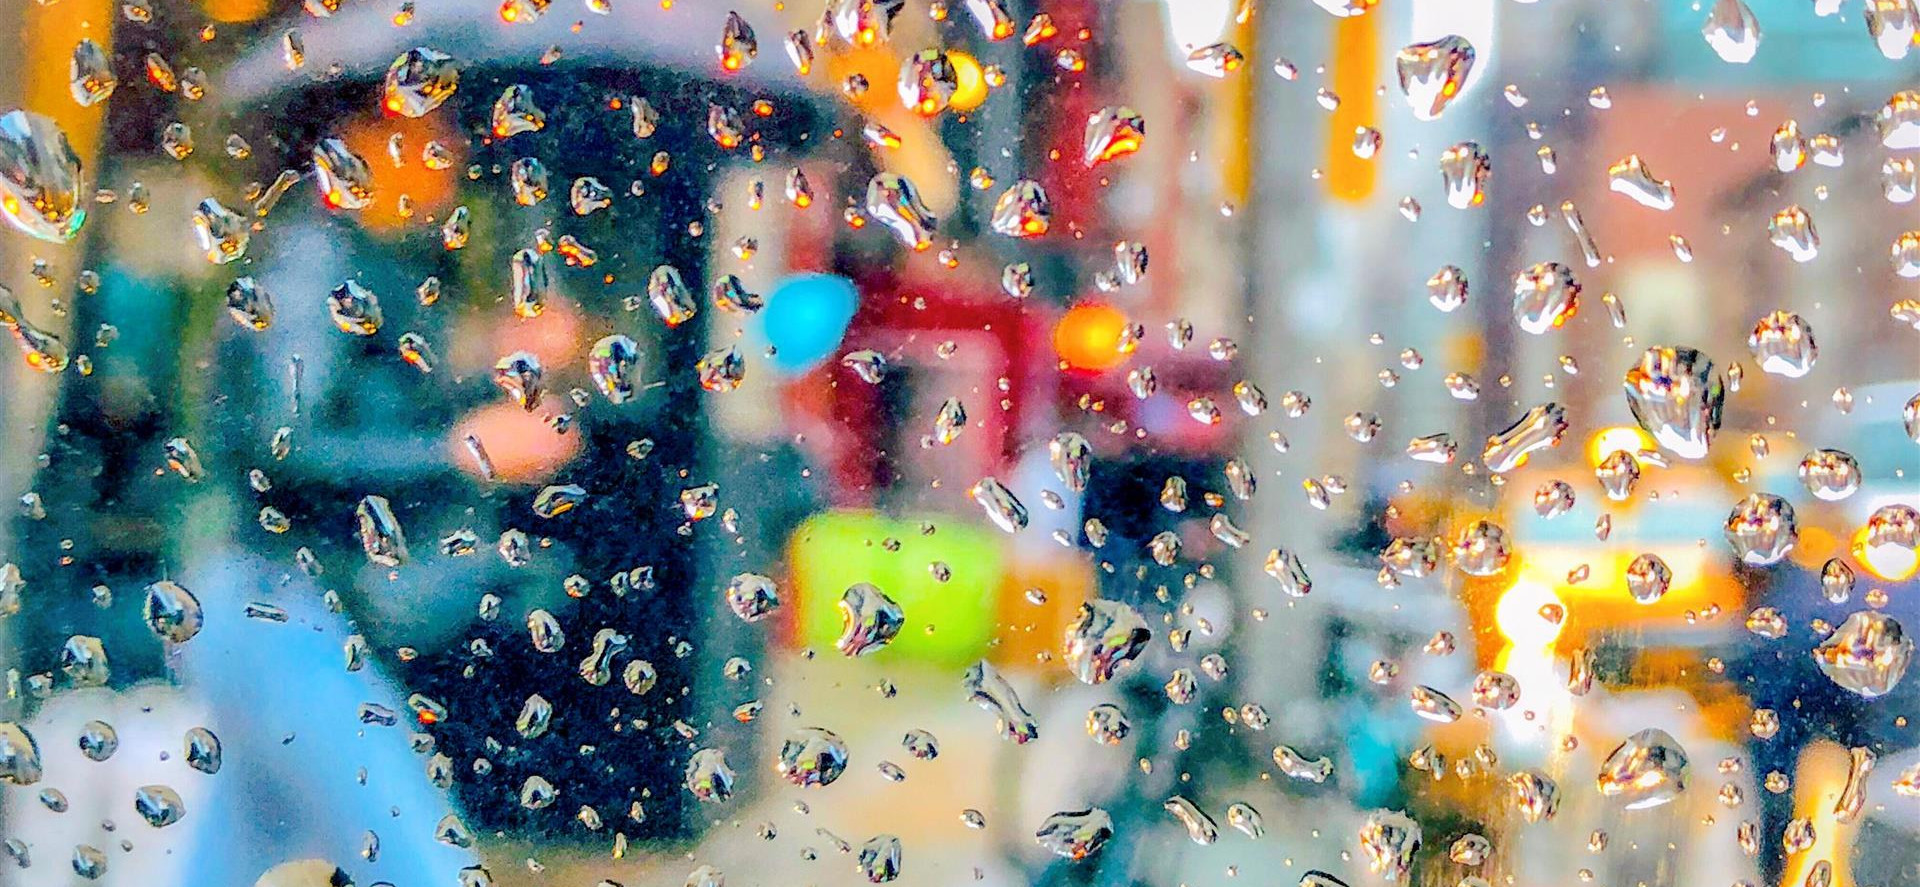 Rainy Days and Mondays by Jude Bartlett